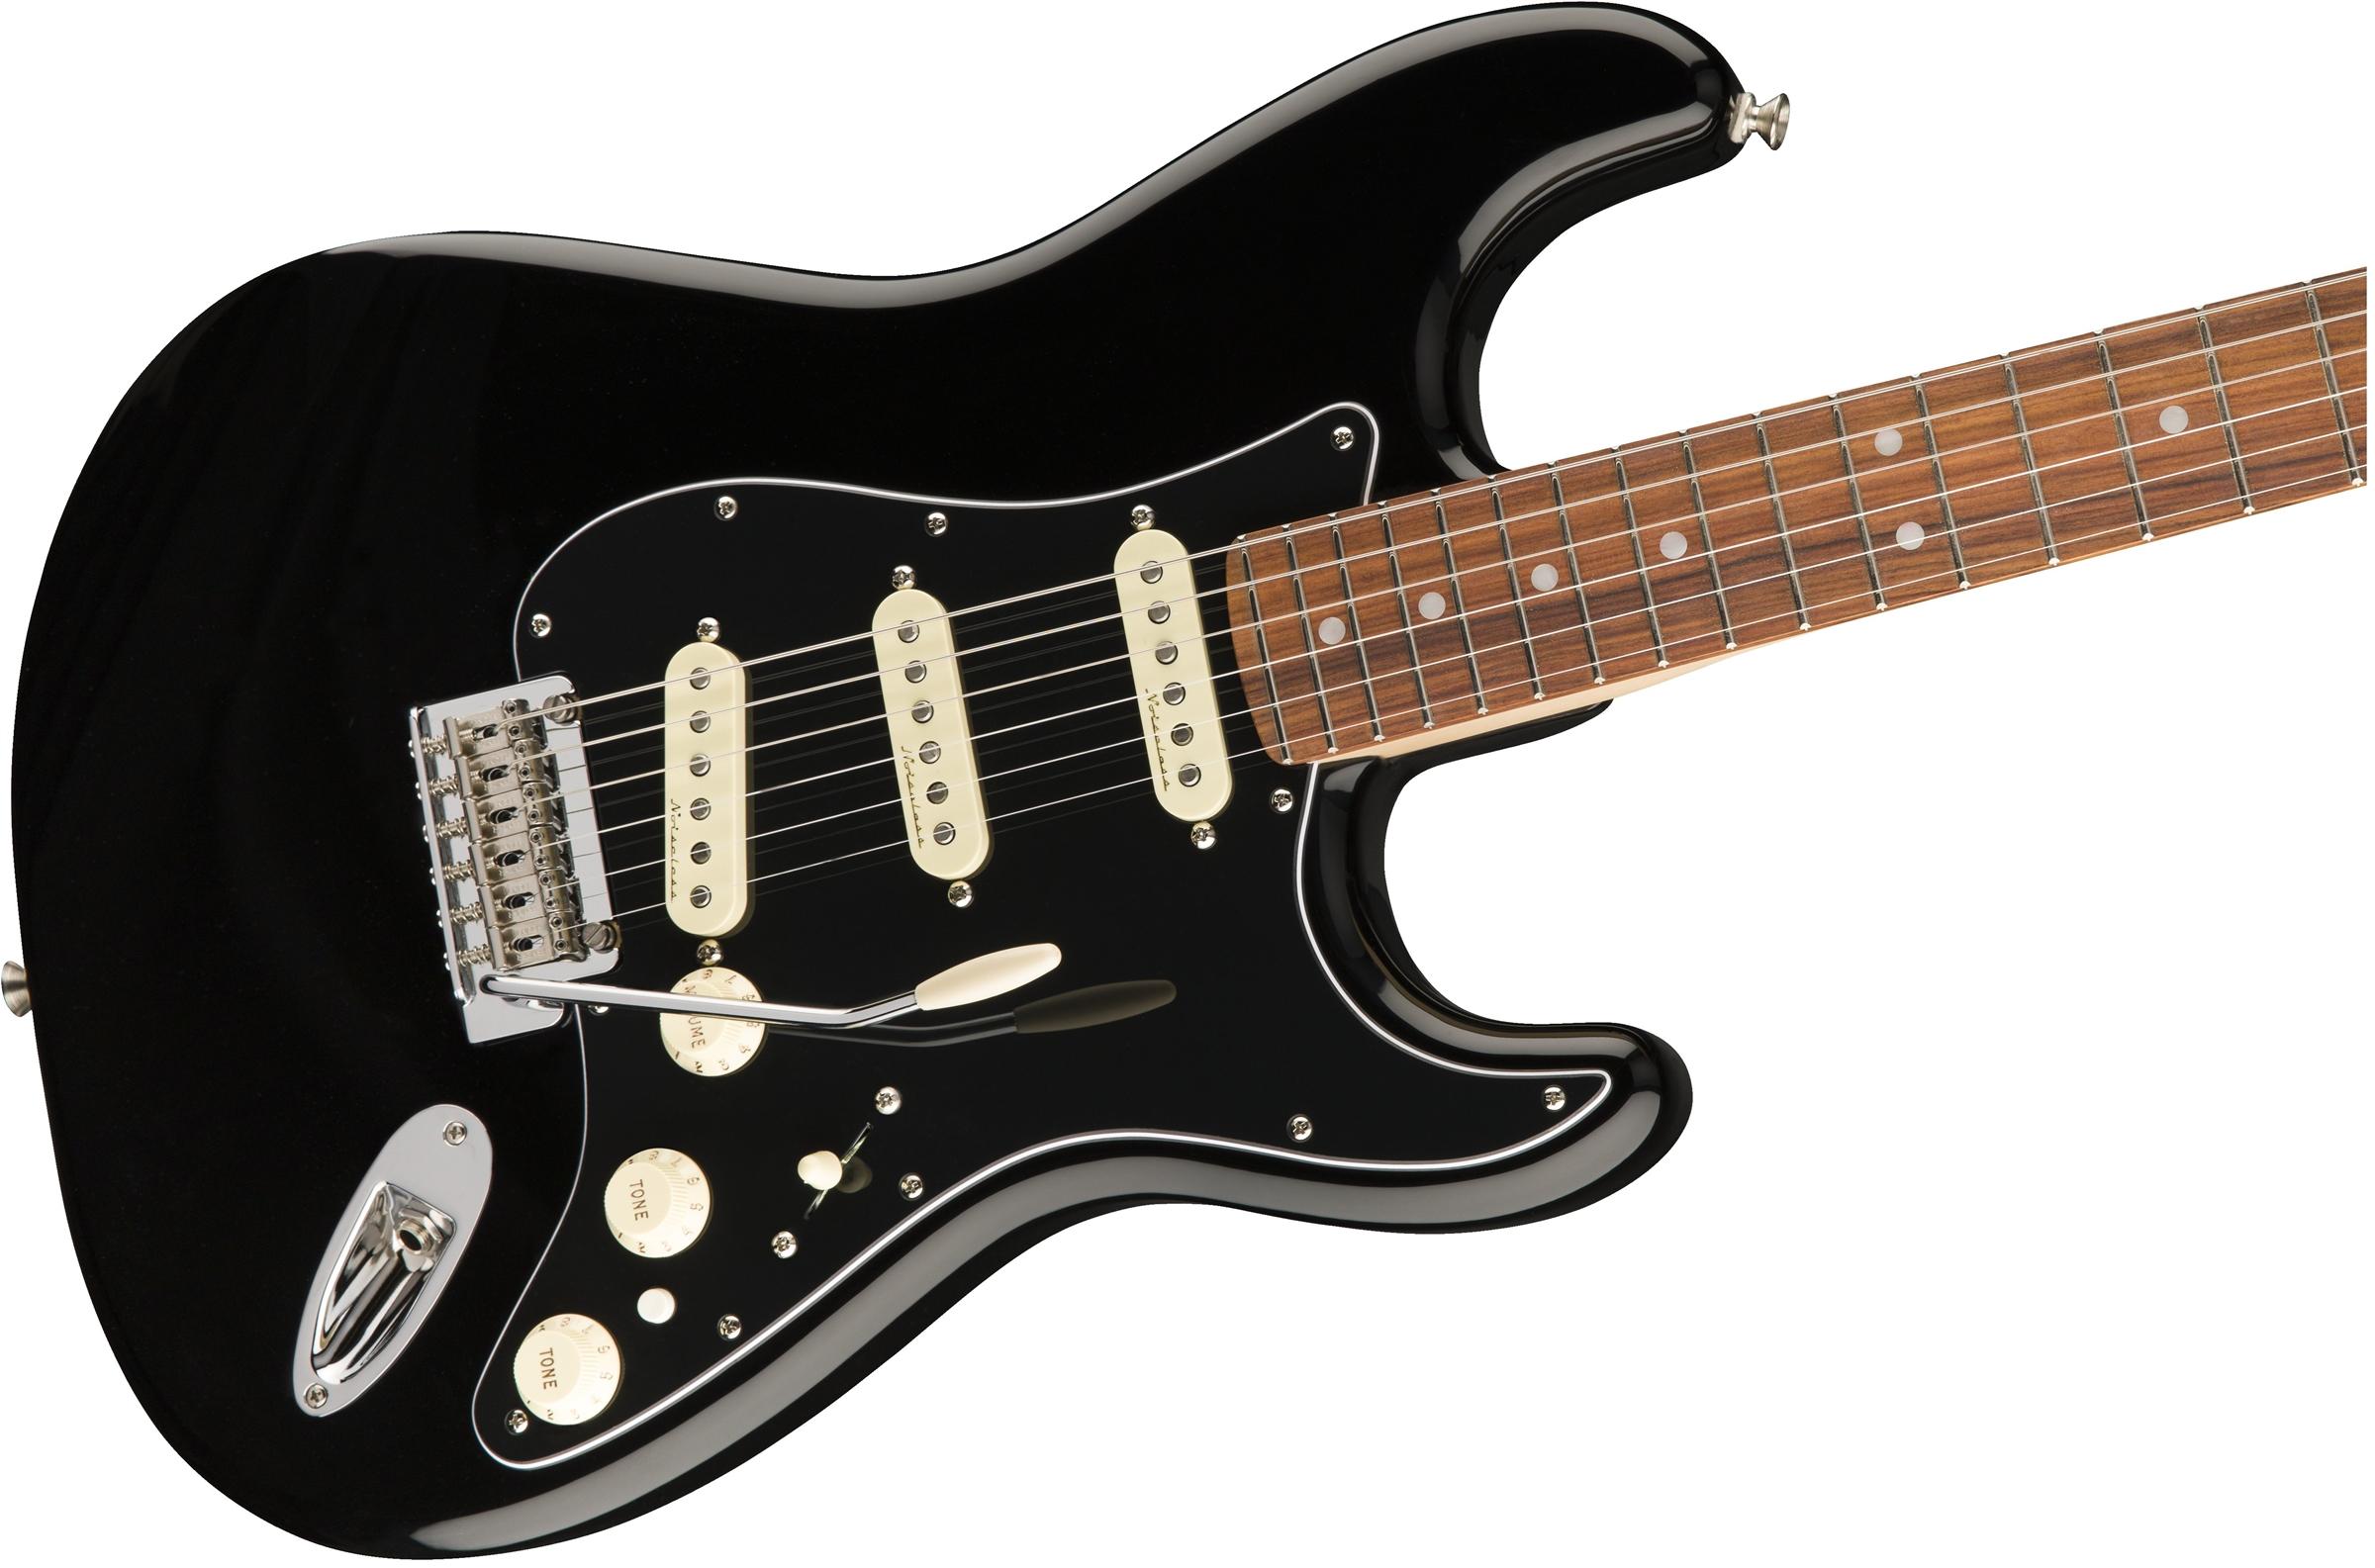 deluxe strat electric guitars. Black Bedroom Furniture Sets. Home Design Ideas